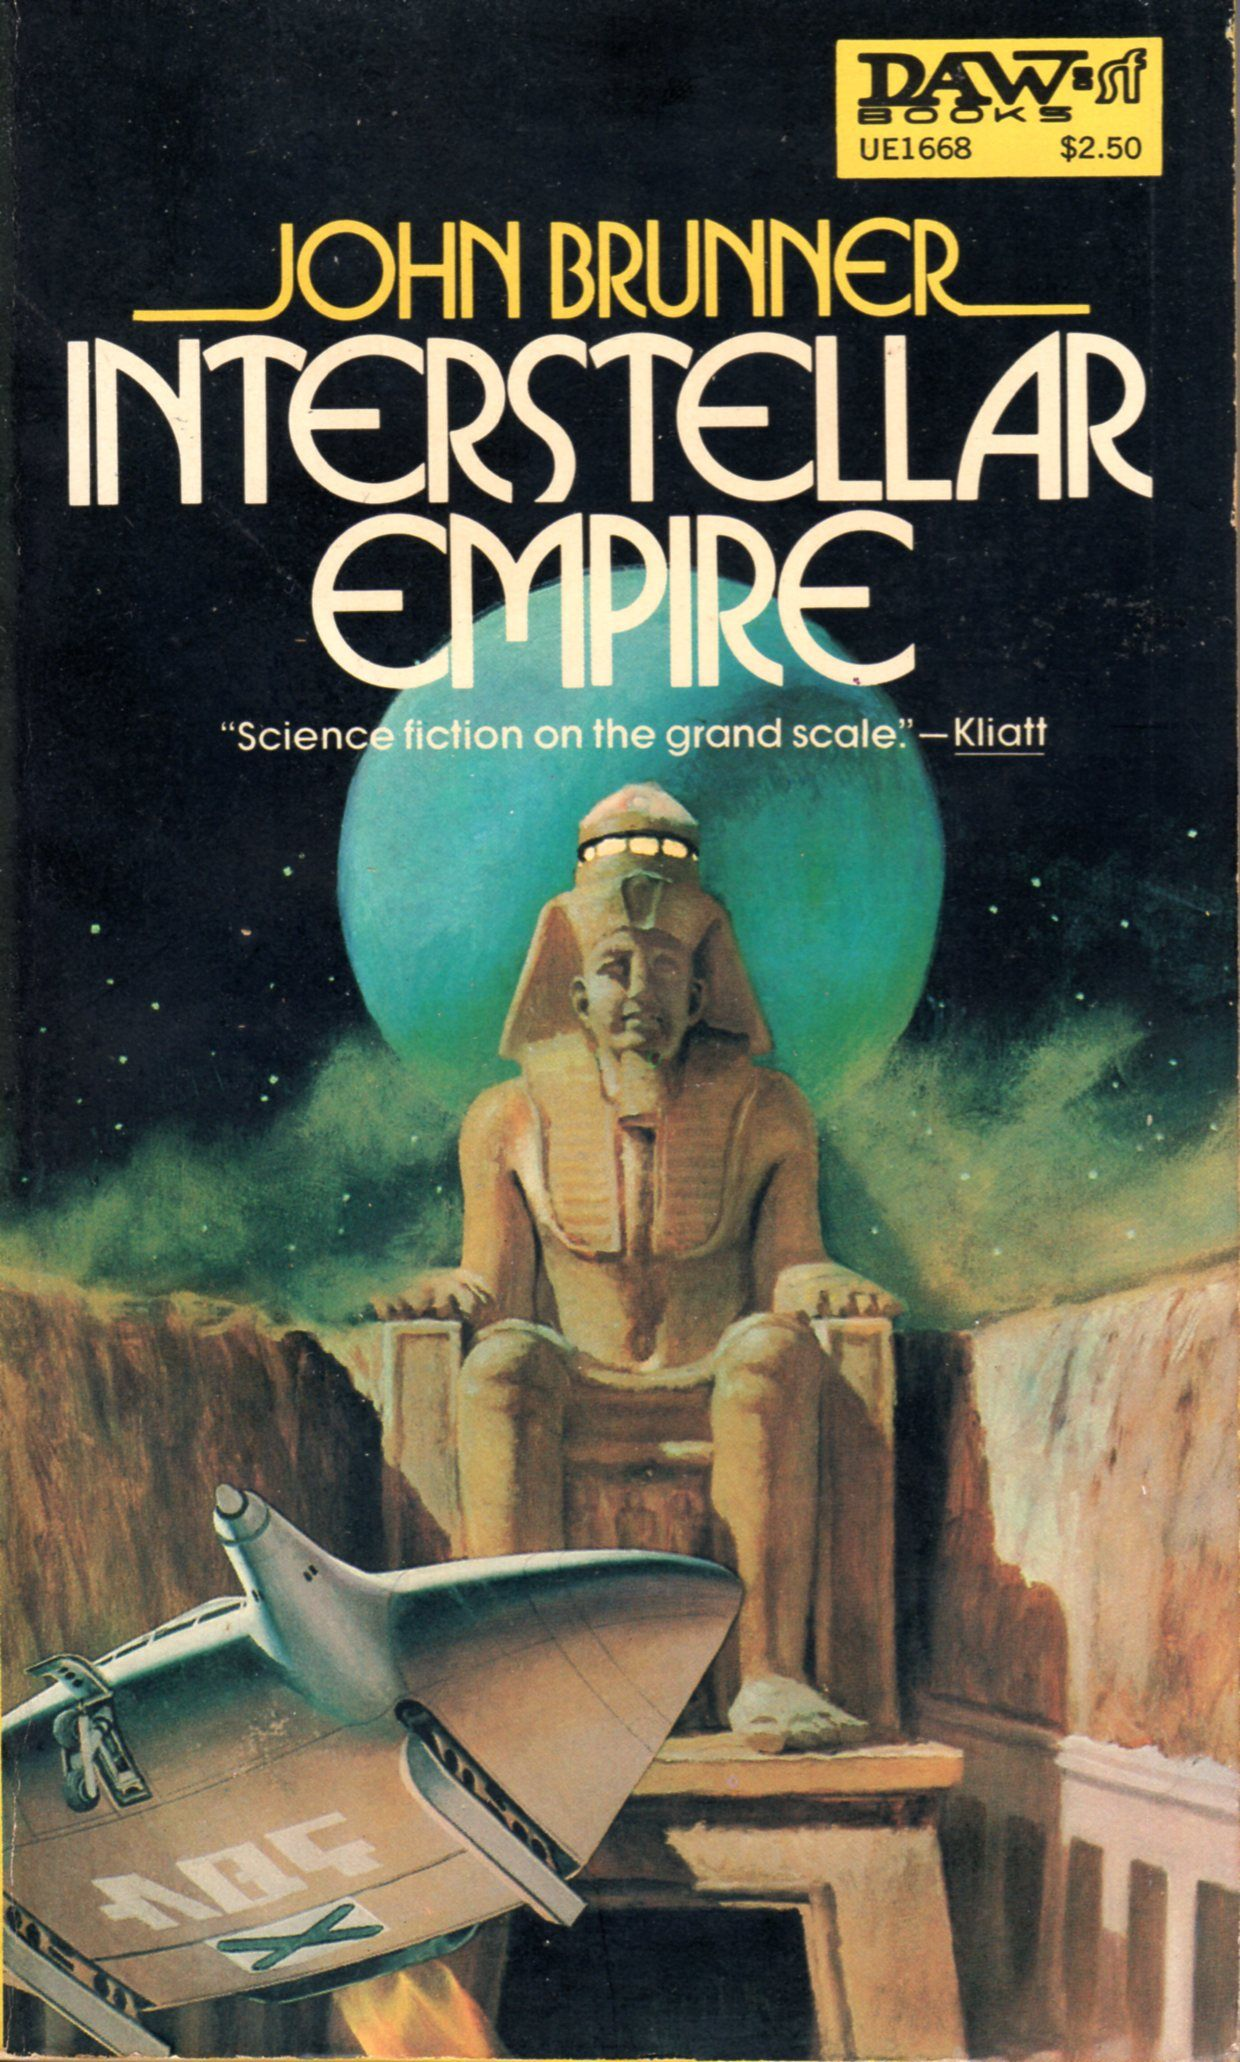 Interstellar Empire - John Brunner Cover Segrelles